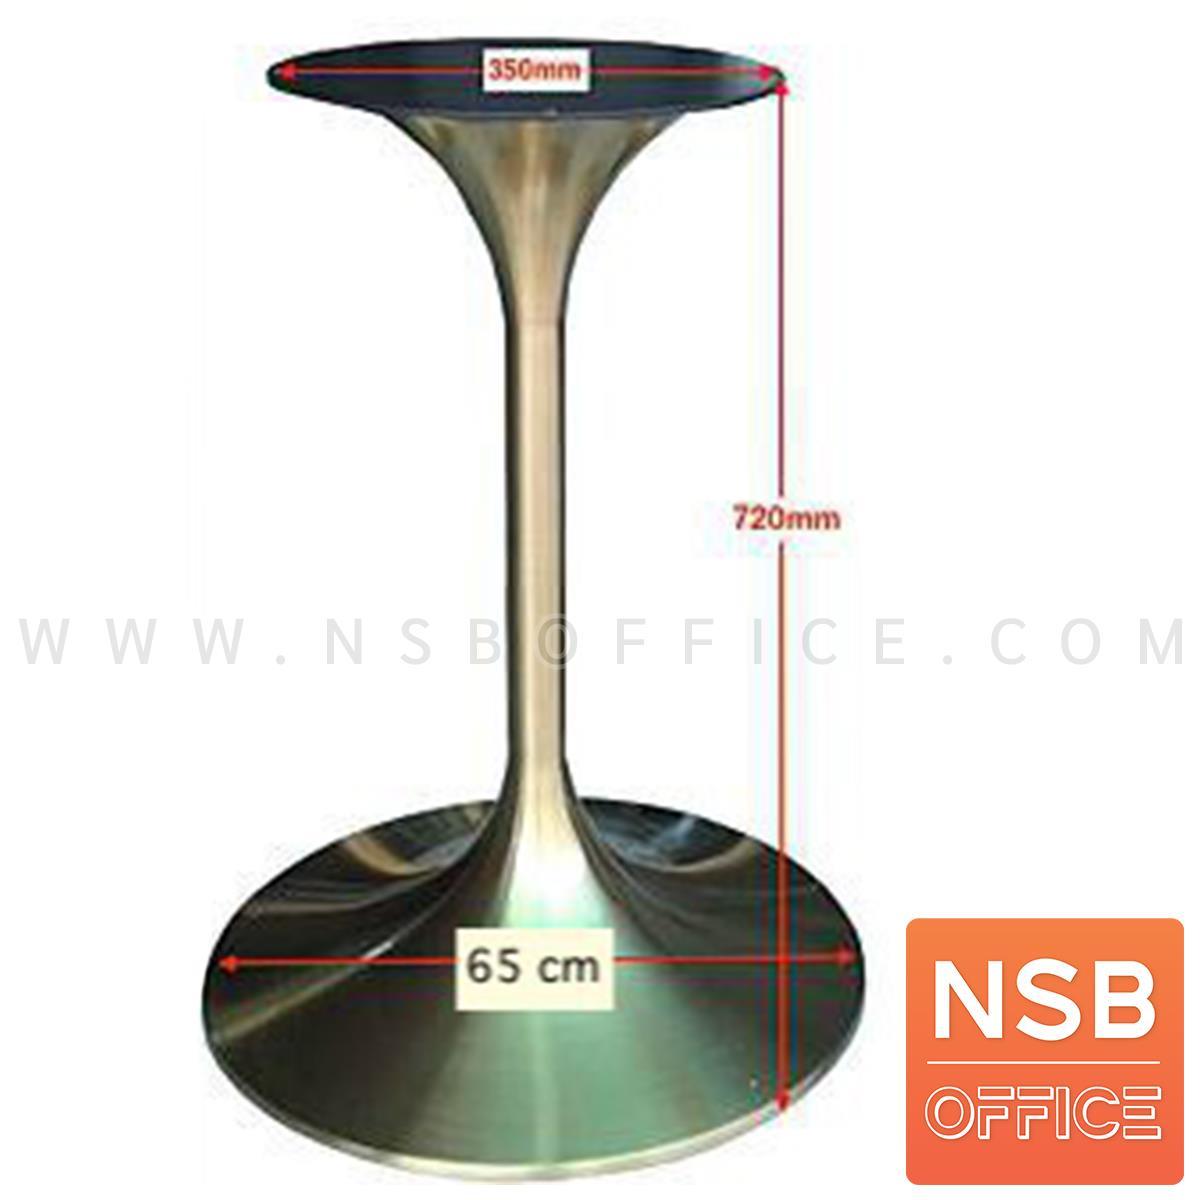 J02A011:ขาโต๊ะจานกลม สเตนเลส รุ่น Bay (เบย์) ขนาด 50Di, 65Di cm.